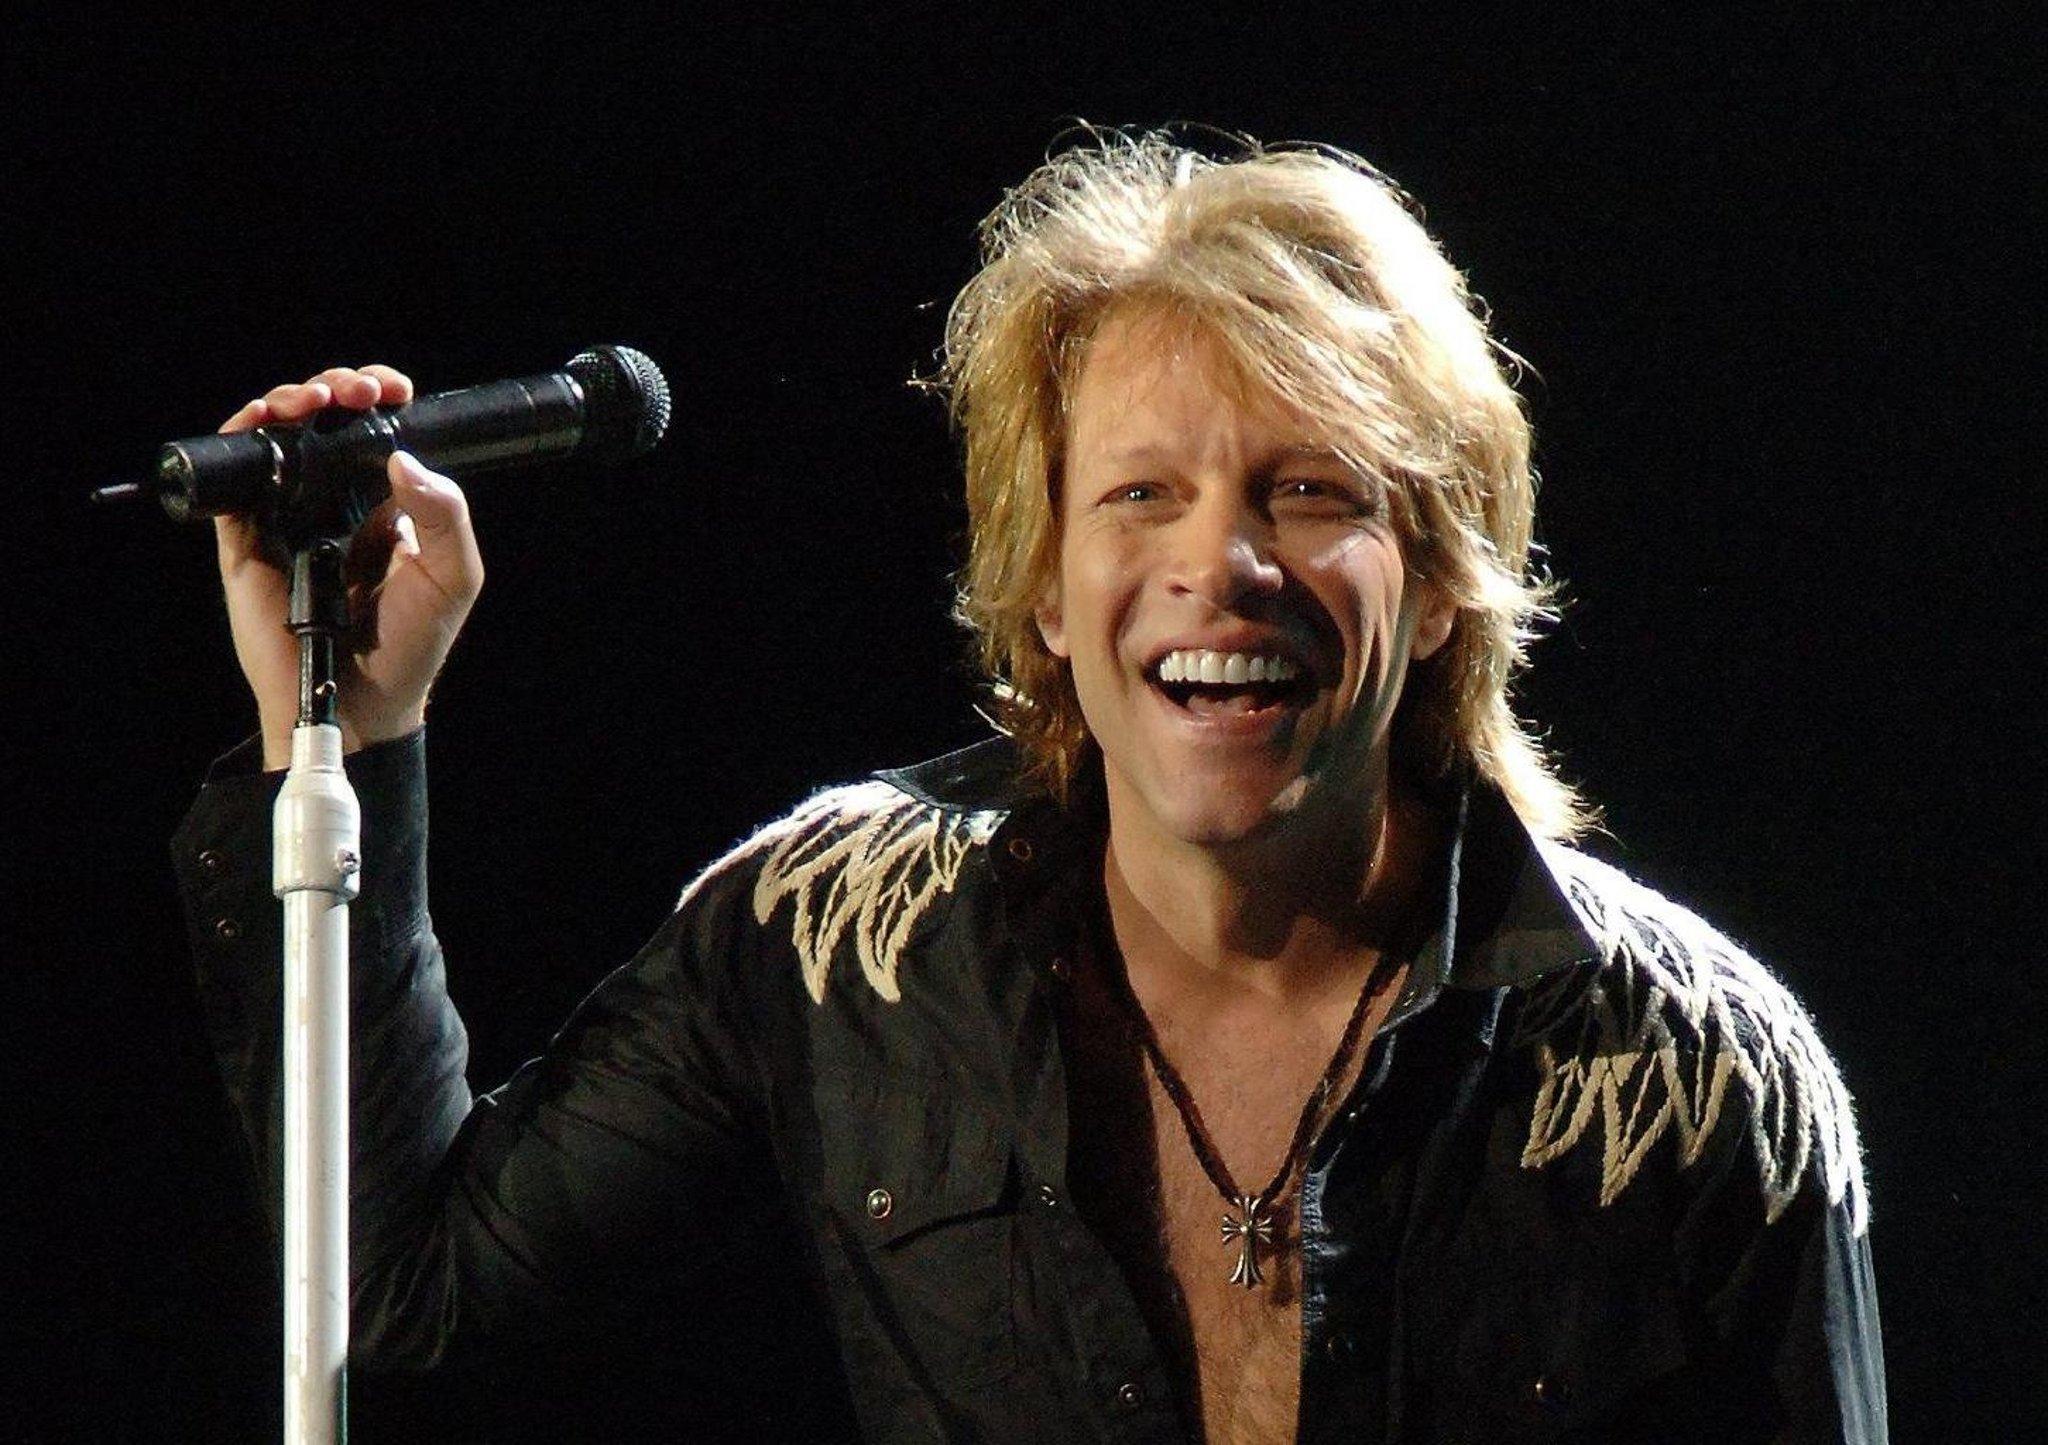 Jon Bon Jovi S Orangemen Beat Up Bono Gaffe Sparks U2 Alternative Facts Trend Belfast News Letter